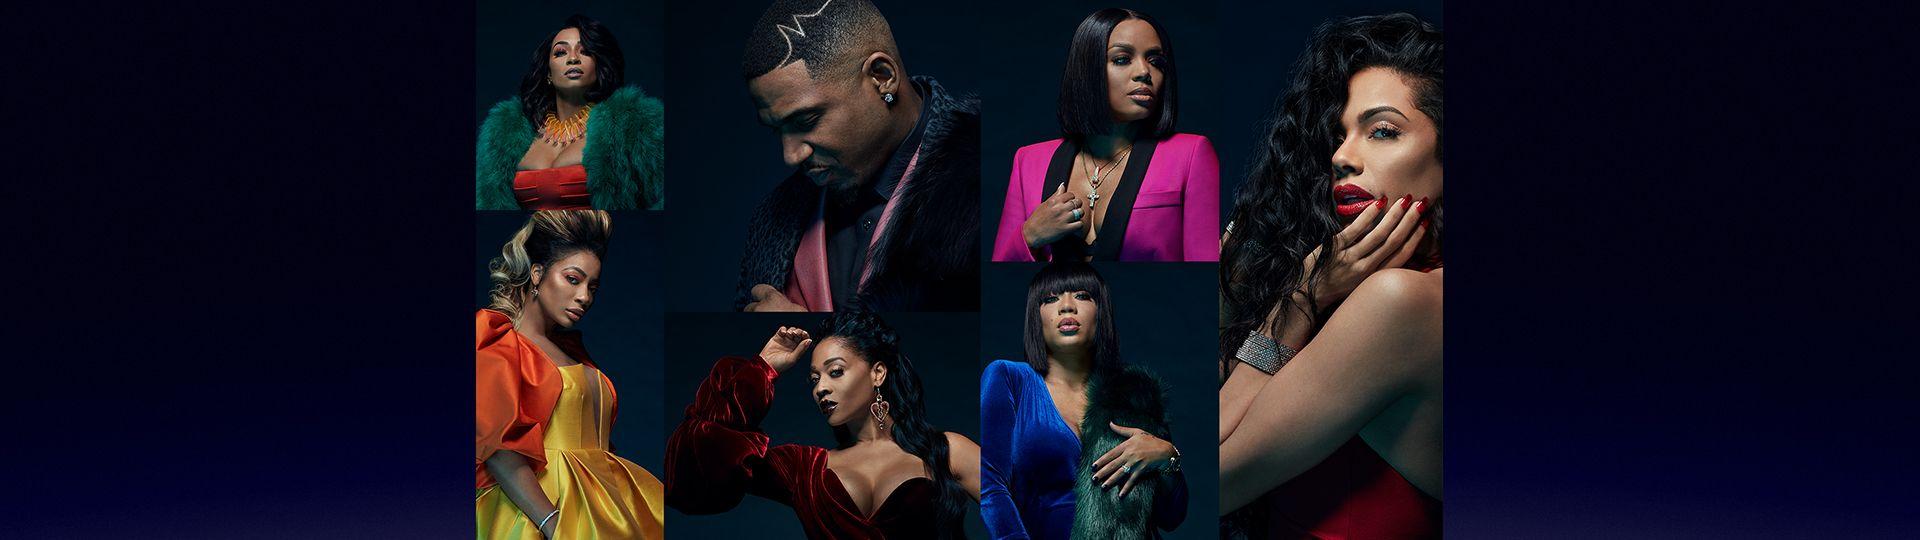 Love & Hip Hop Last Episode